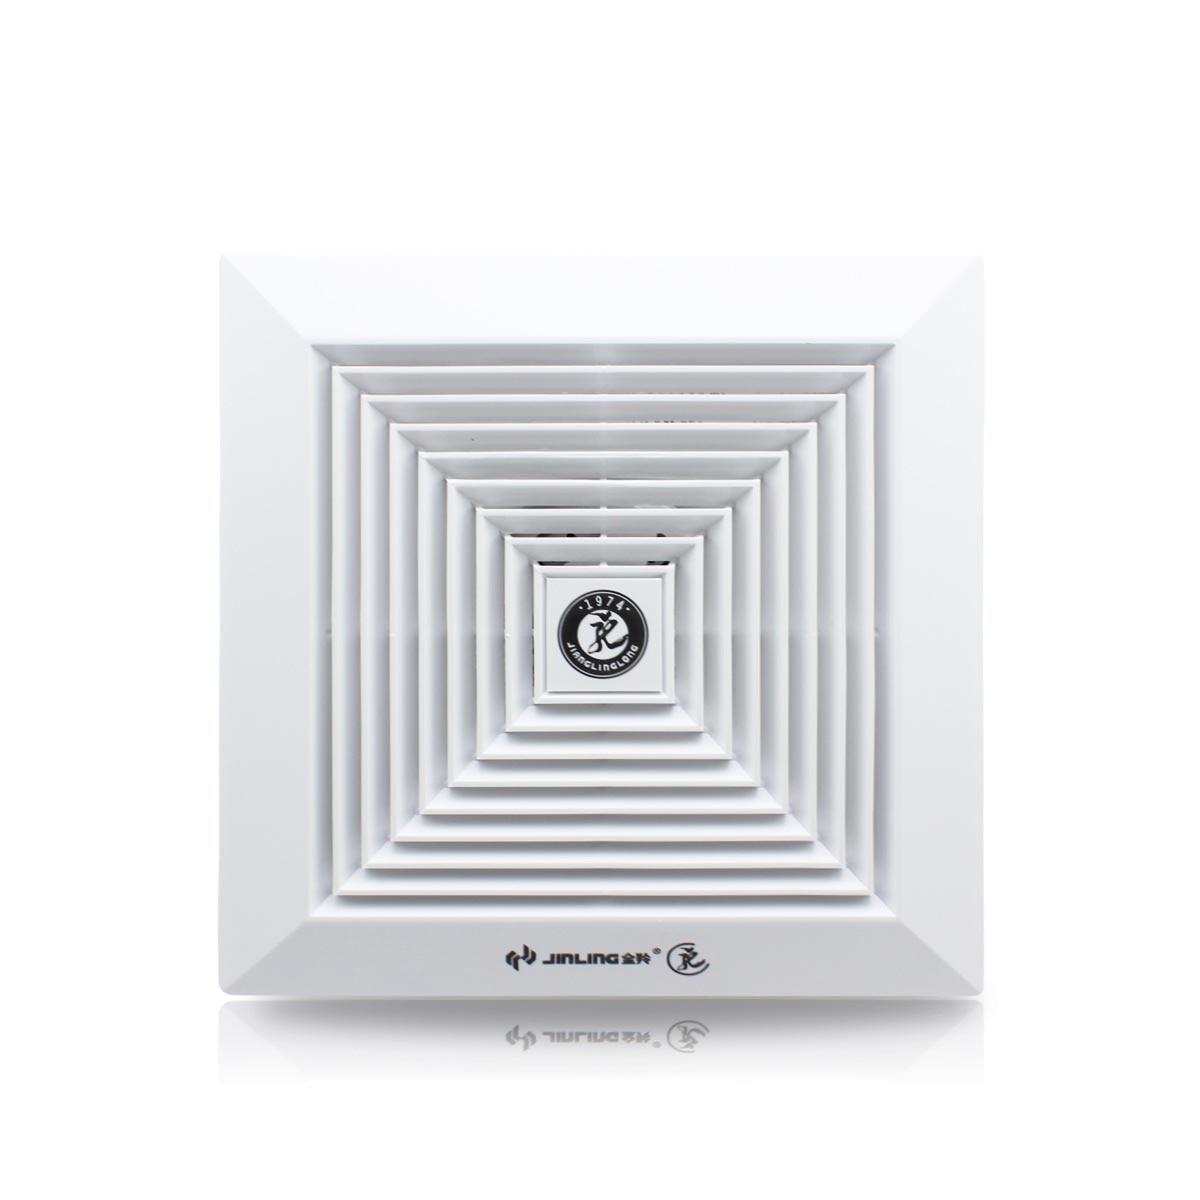 ventilation fans bathroom toilet mute fan exhaust window walls 230*230mm remove TVOC HCHO PM2.5 tvoc tvoc tvoc